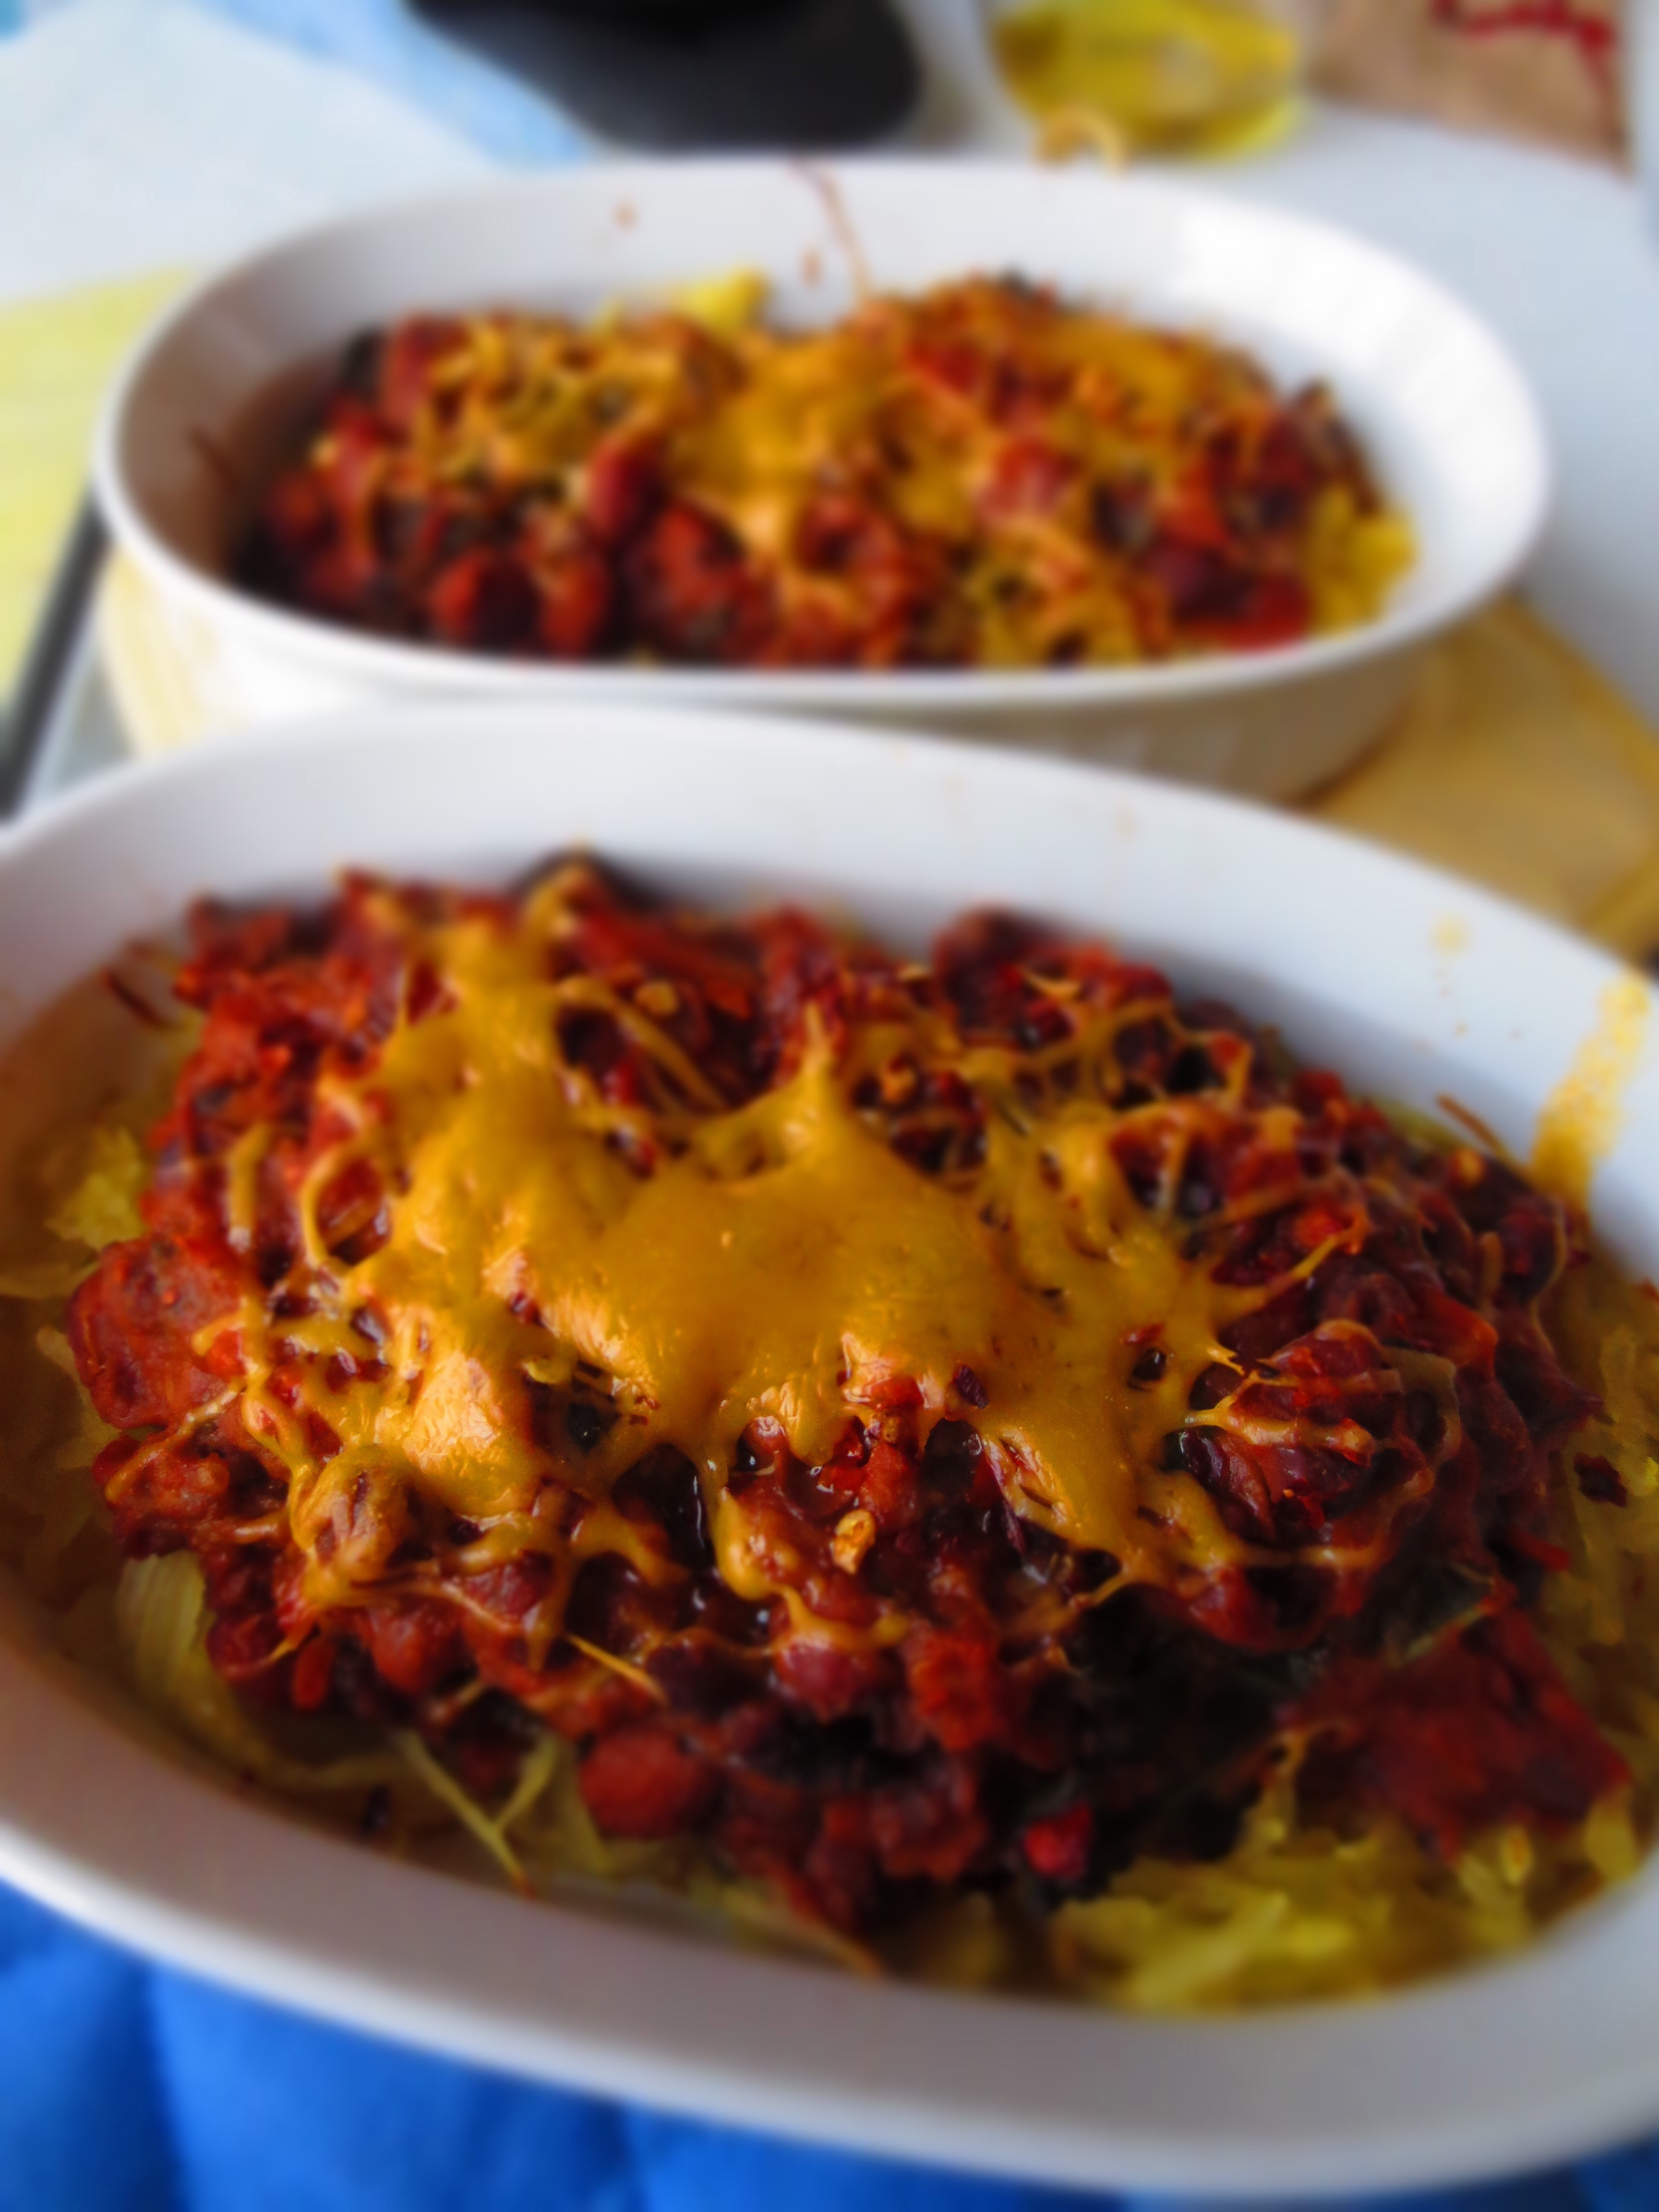 Vegetarian Chili With Squash  Easy Ve arian Chili & Spaghetti Squash